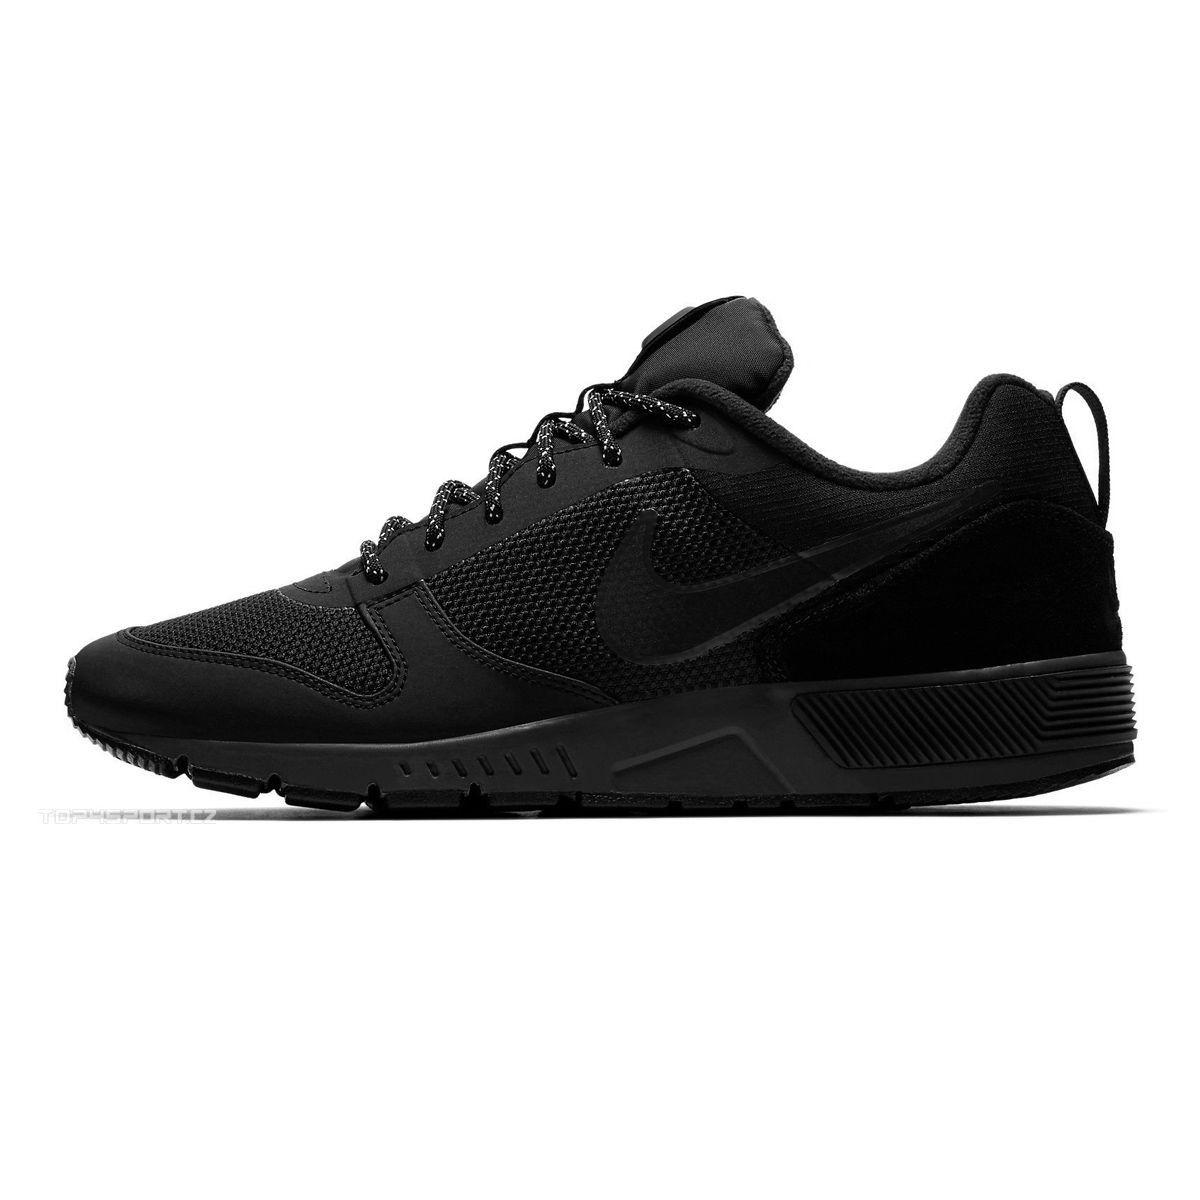 Nike Nightgazer Trail Spor Ayakkabısı 916775002